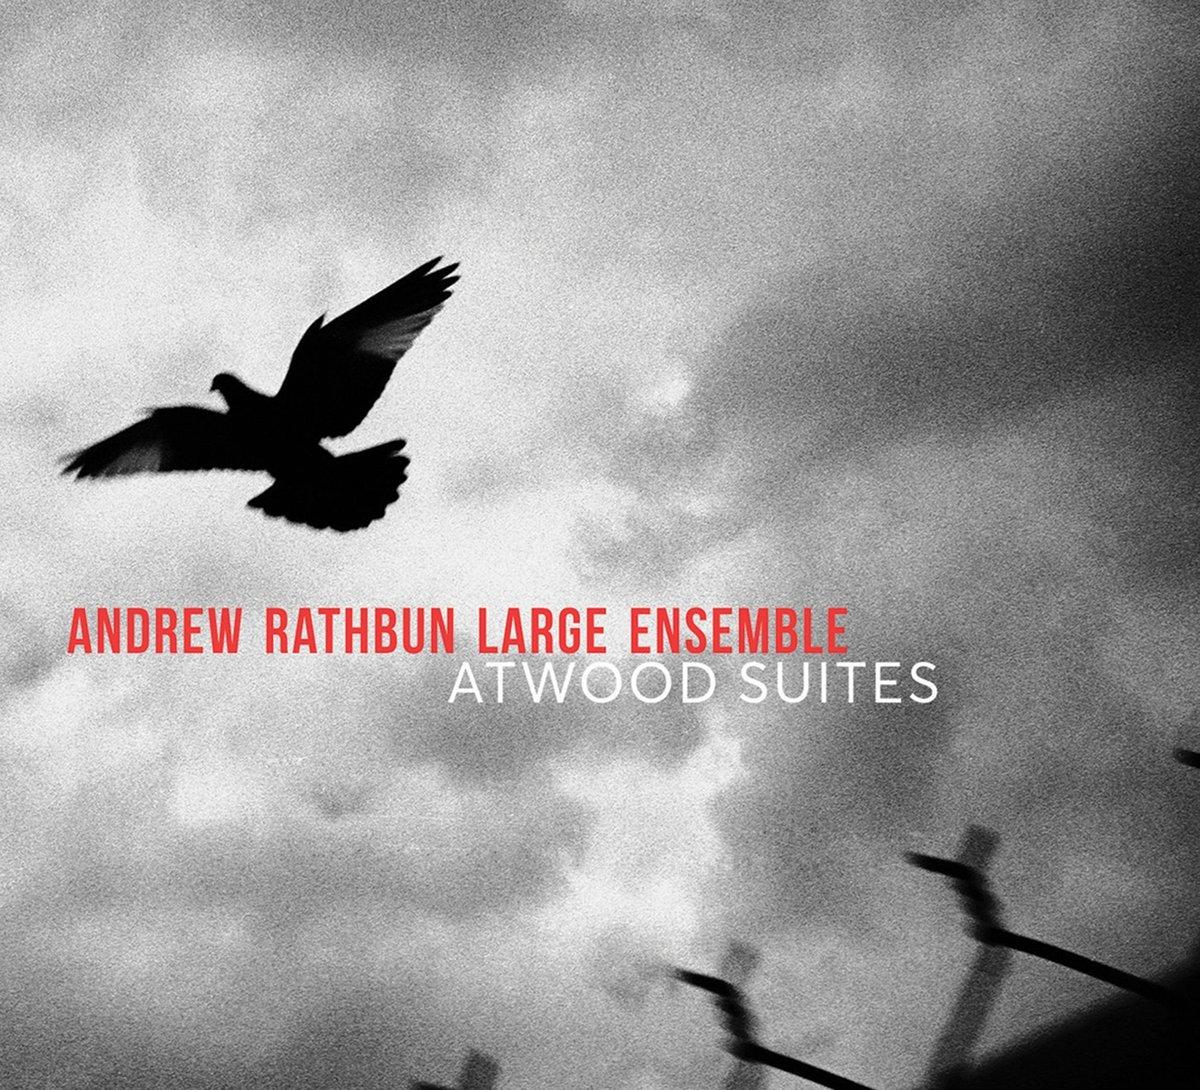 Andrew Rathbun Large Ensemble - Atwood Suites (2018) [FLAC] Download